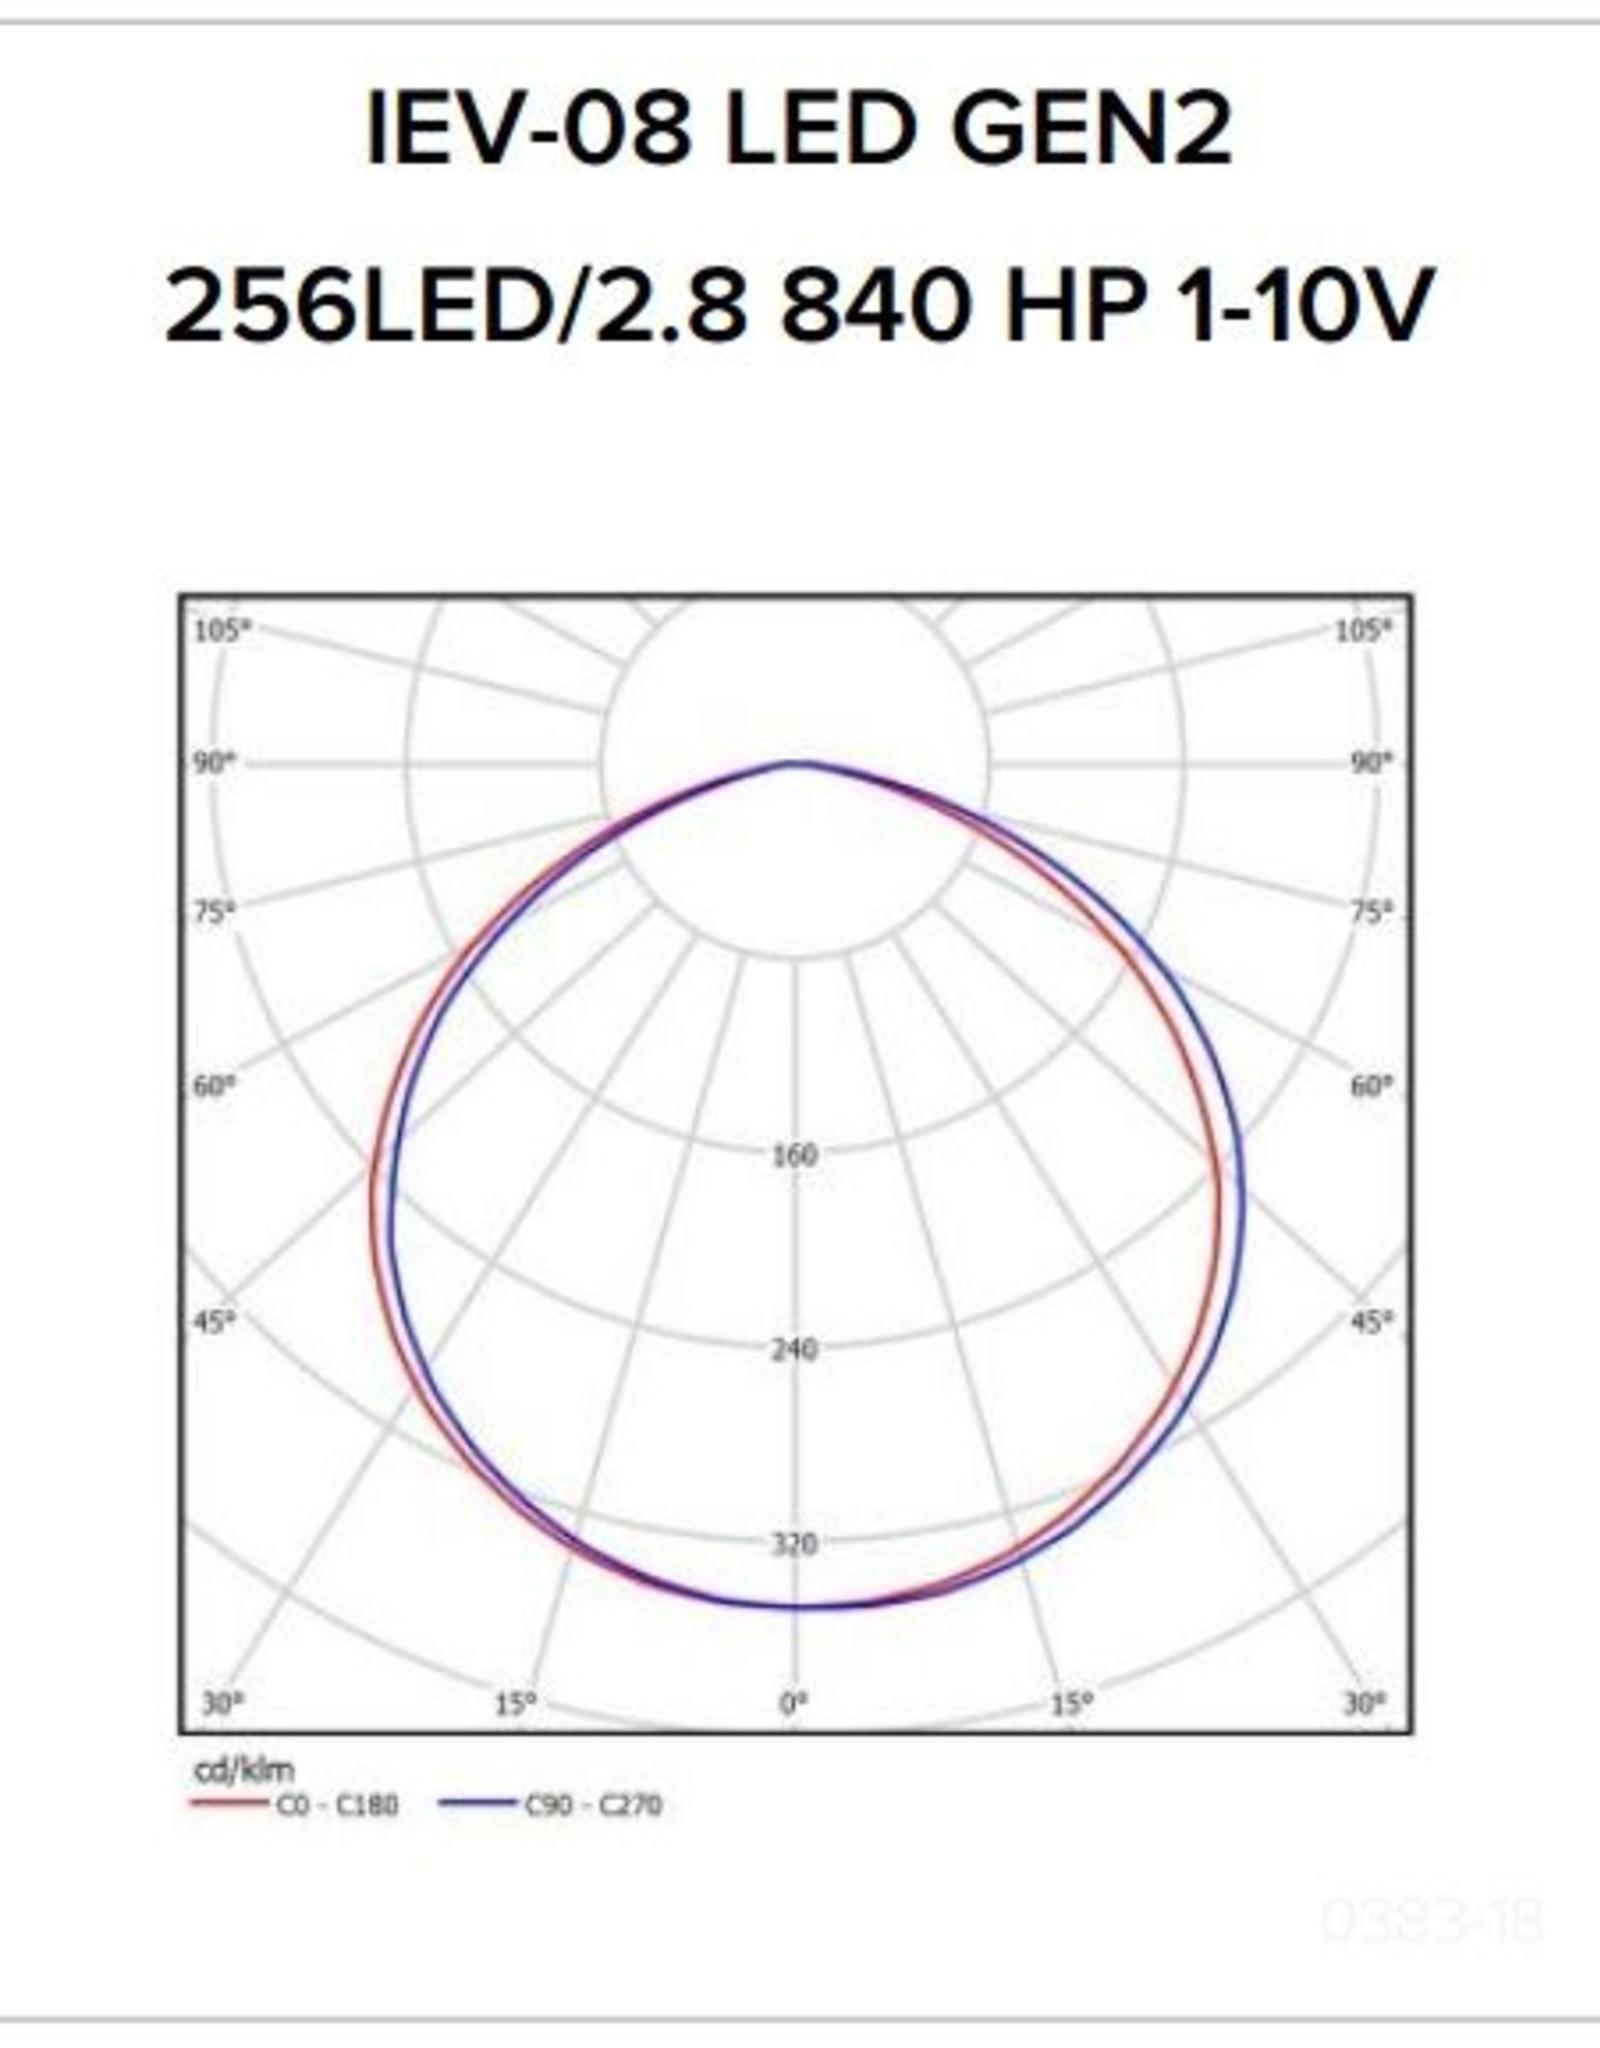 watts ON watts ON Bay GEN 2 - 13886lm